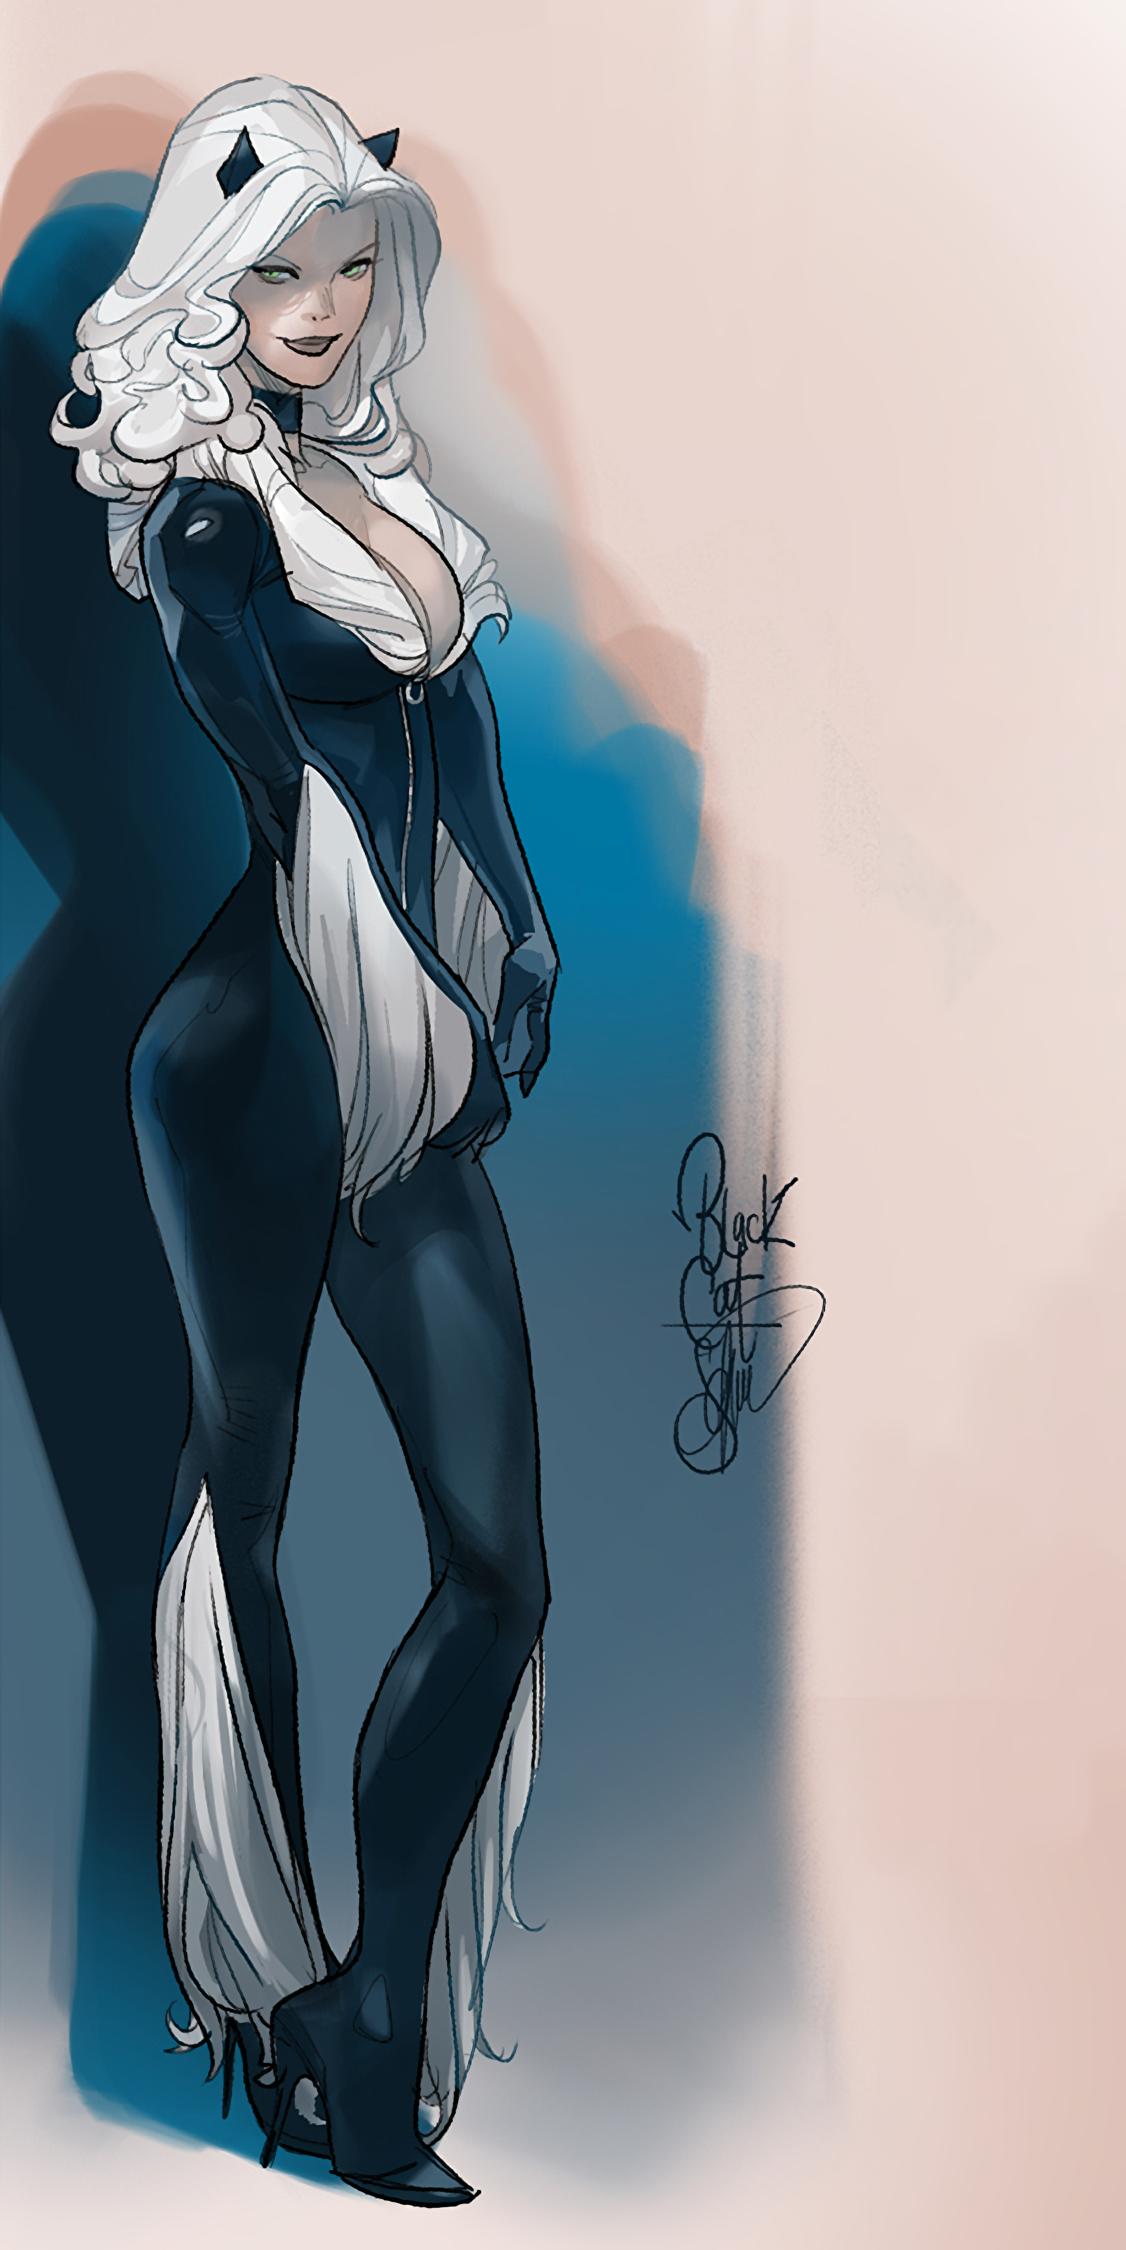 Ms Hardy Black Cat Otto Schmidt Black Cat Marvel Black Cat Marvel Comics Spiderman Black Cat